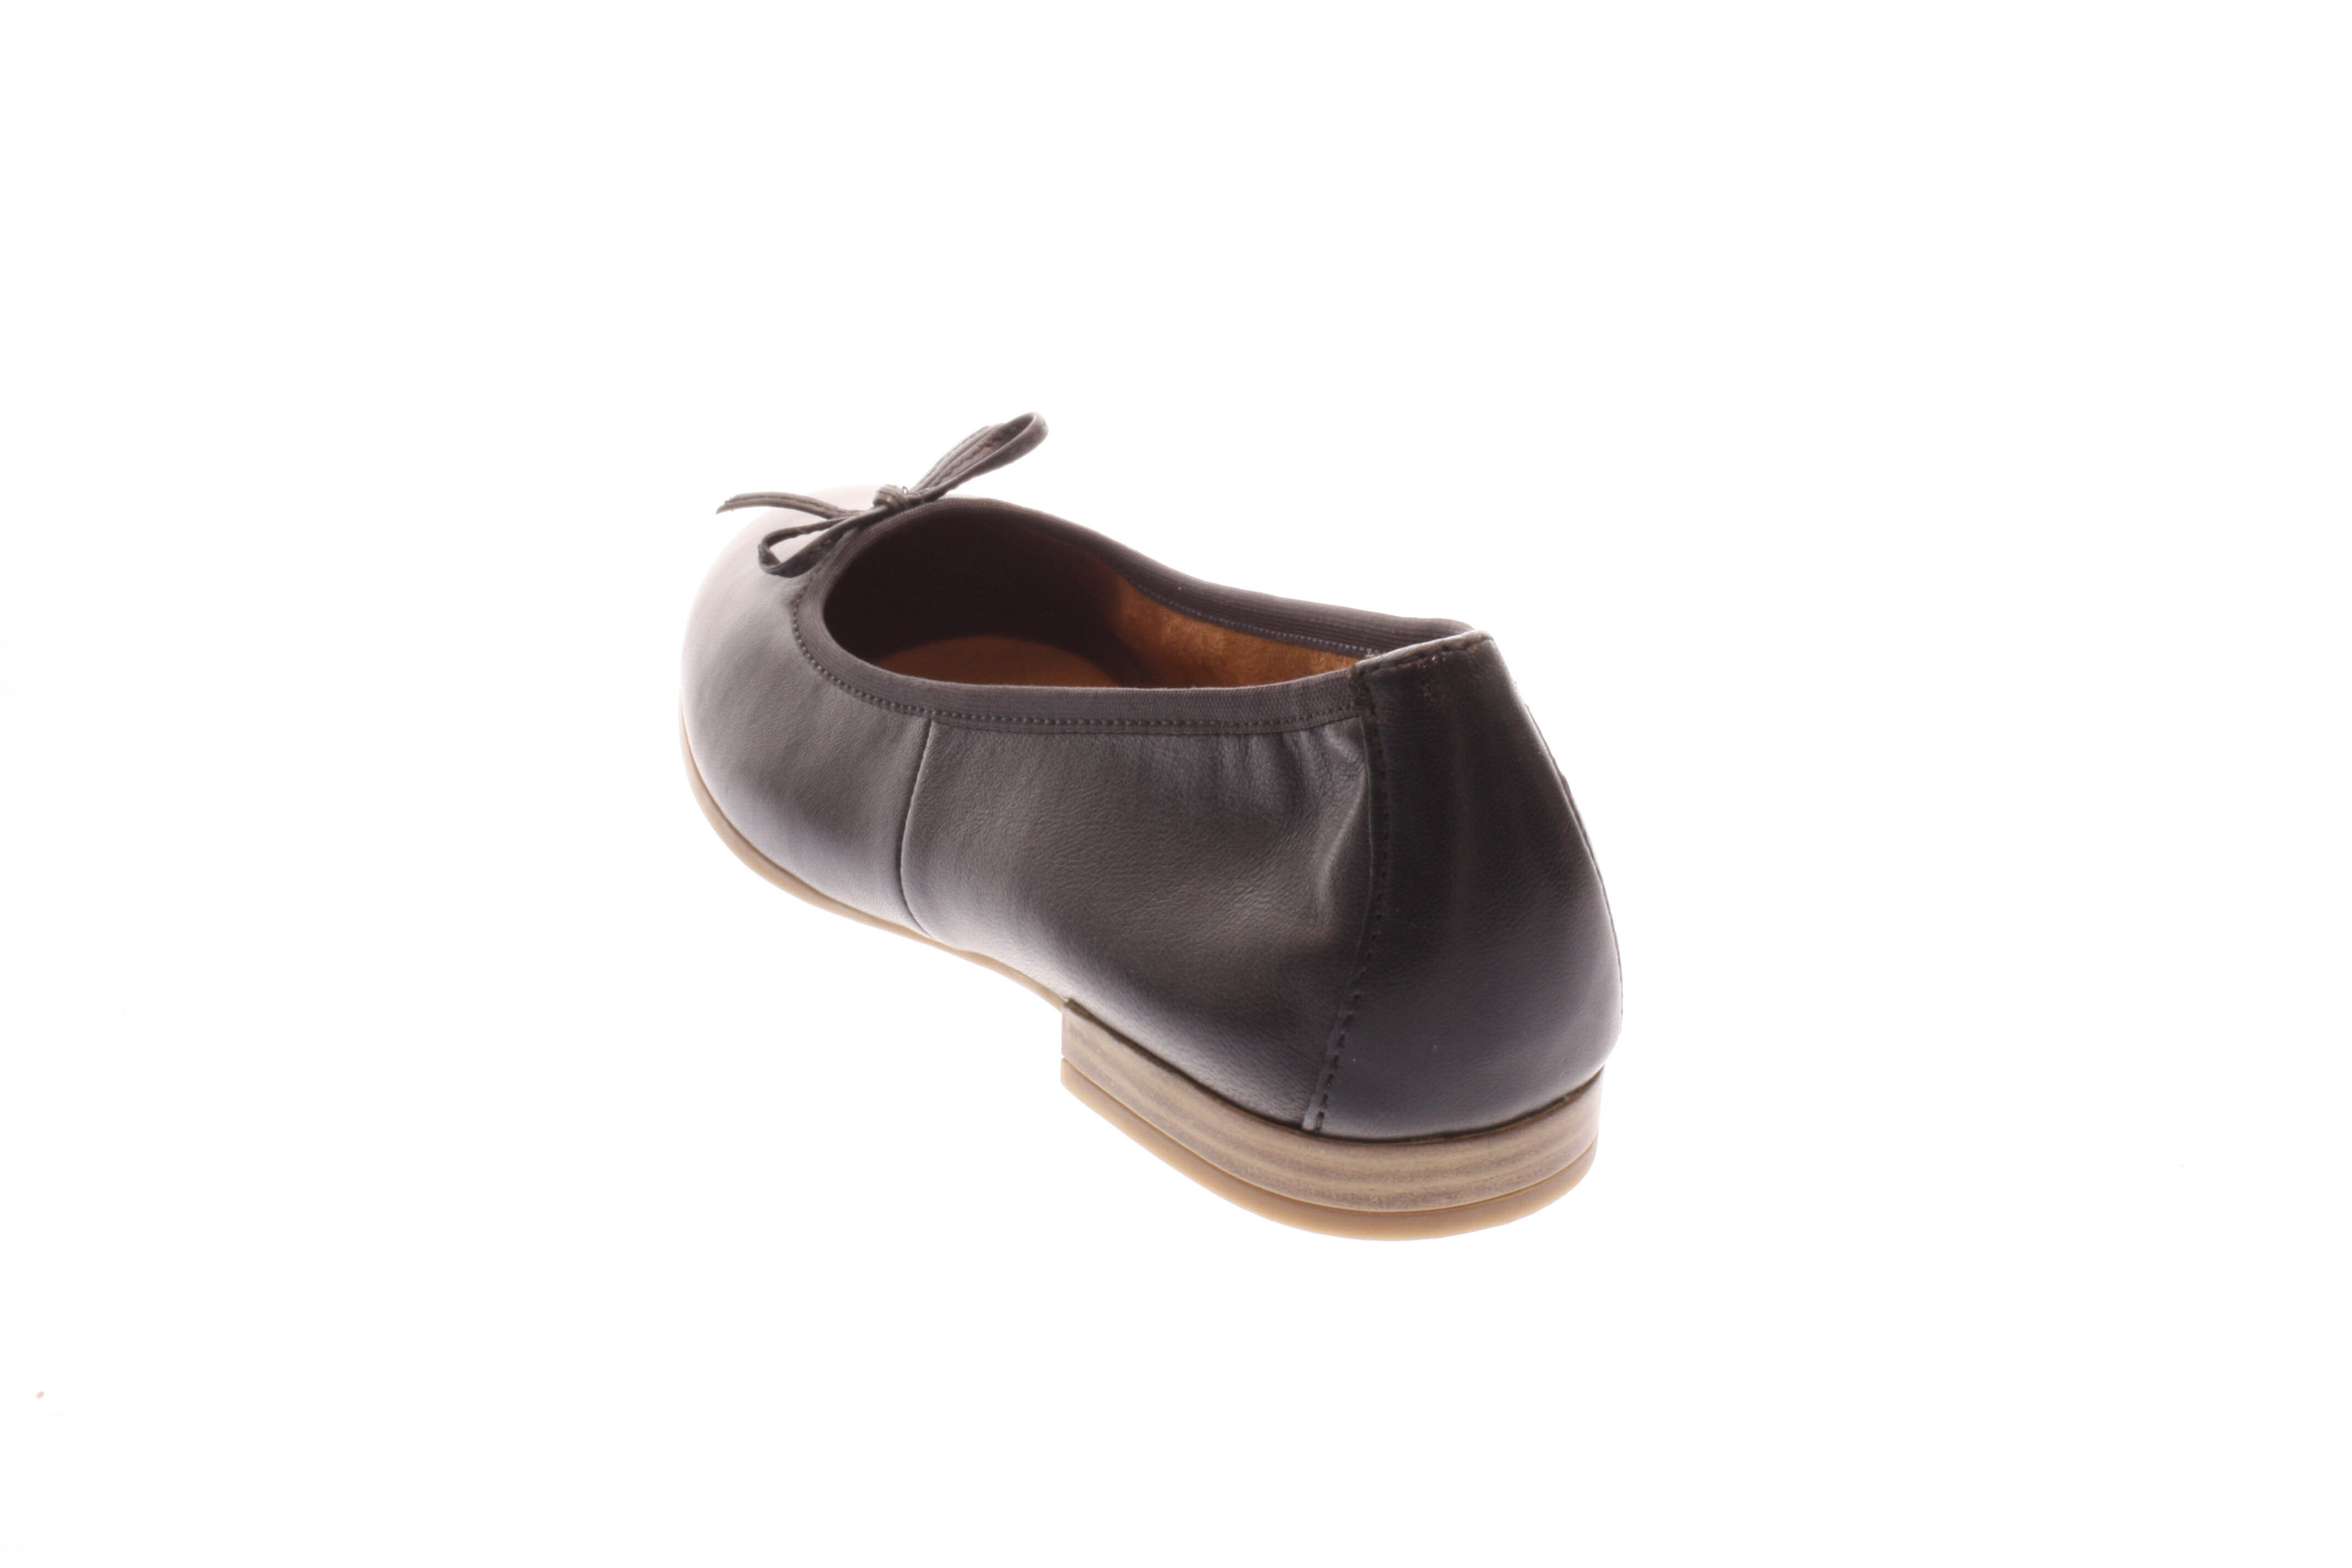 tamaris damen ballerina slipper 805 navy blau 1 1 22116 28 2 schuhe neu ebay. Black Bedroom Furniture Sets. Home Design Ideas